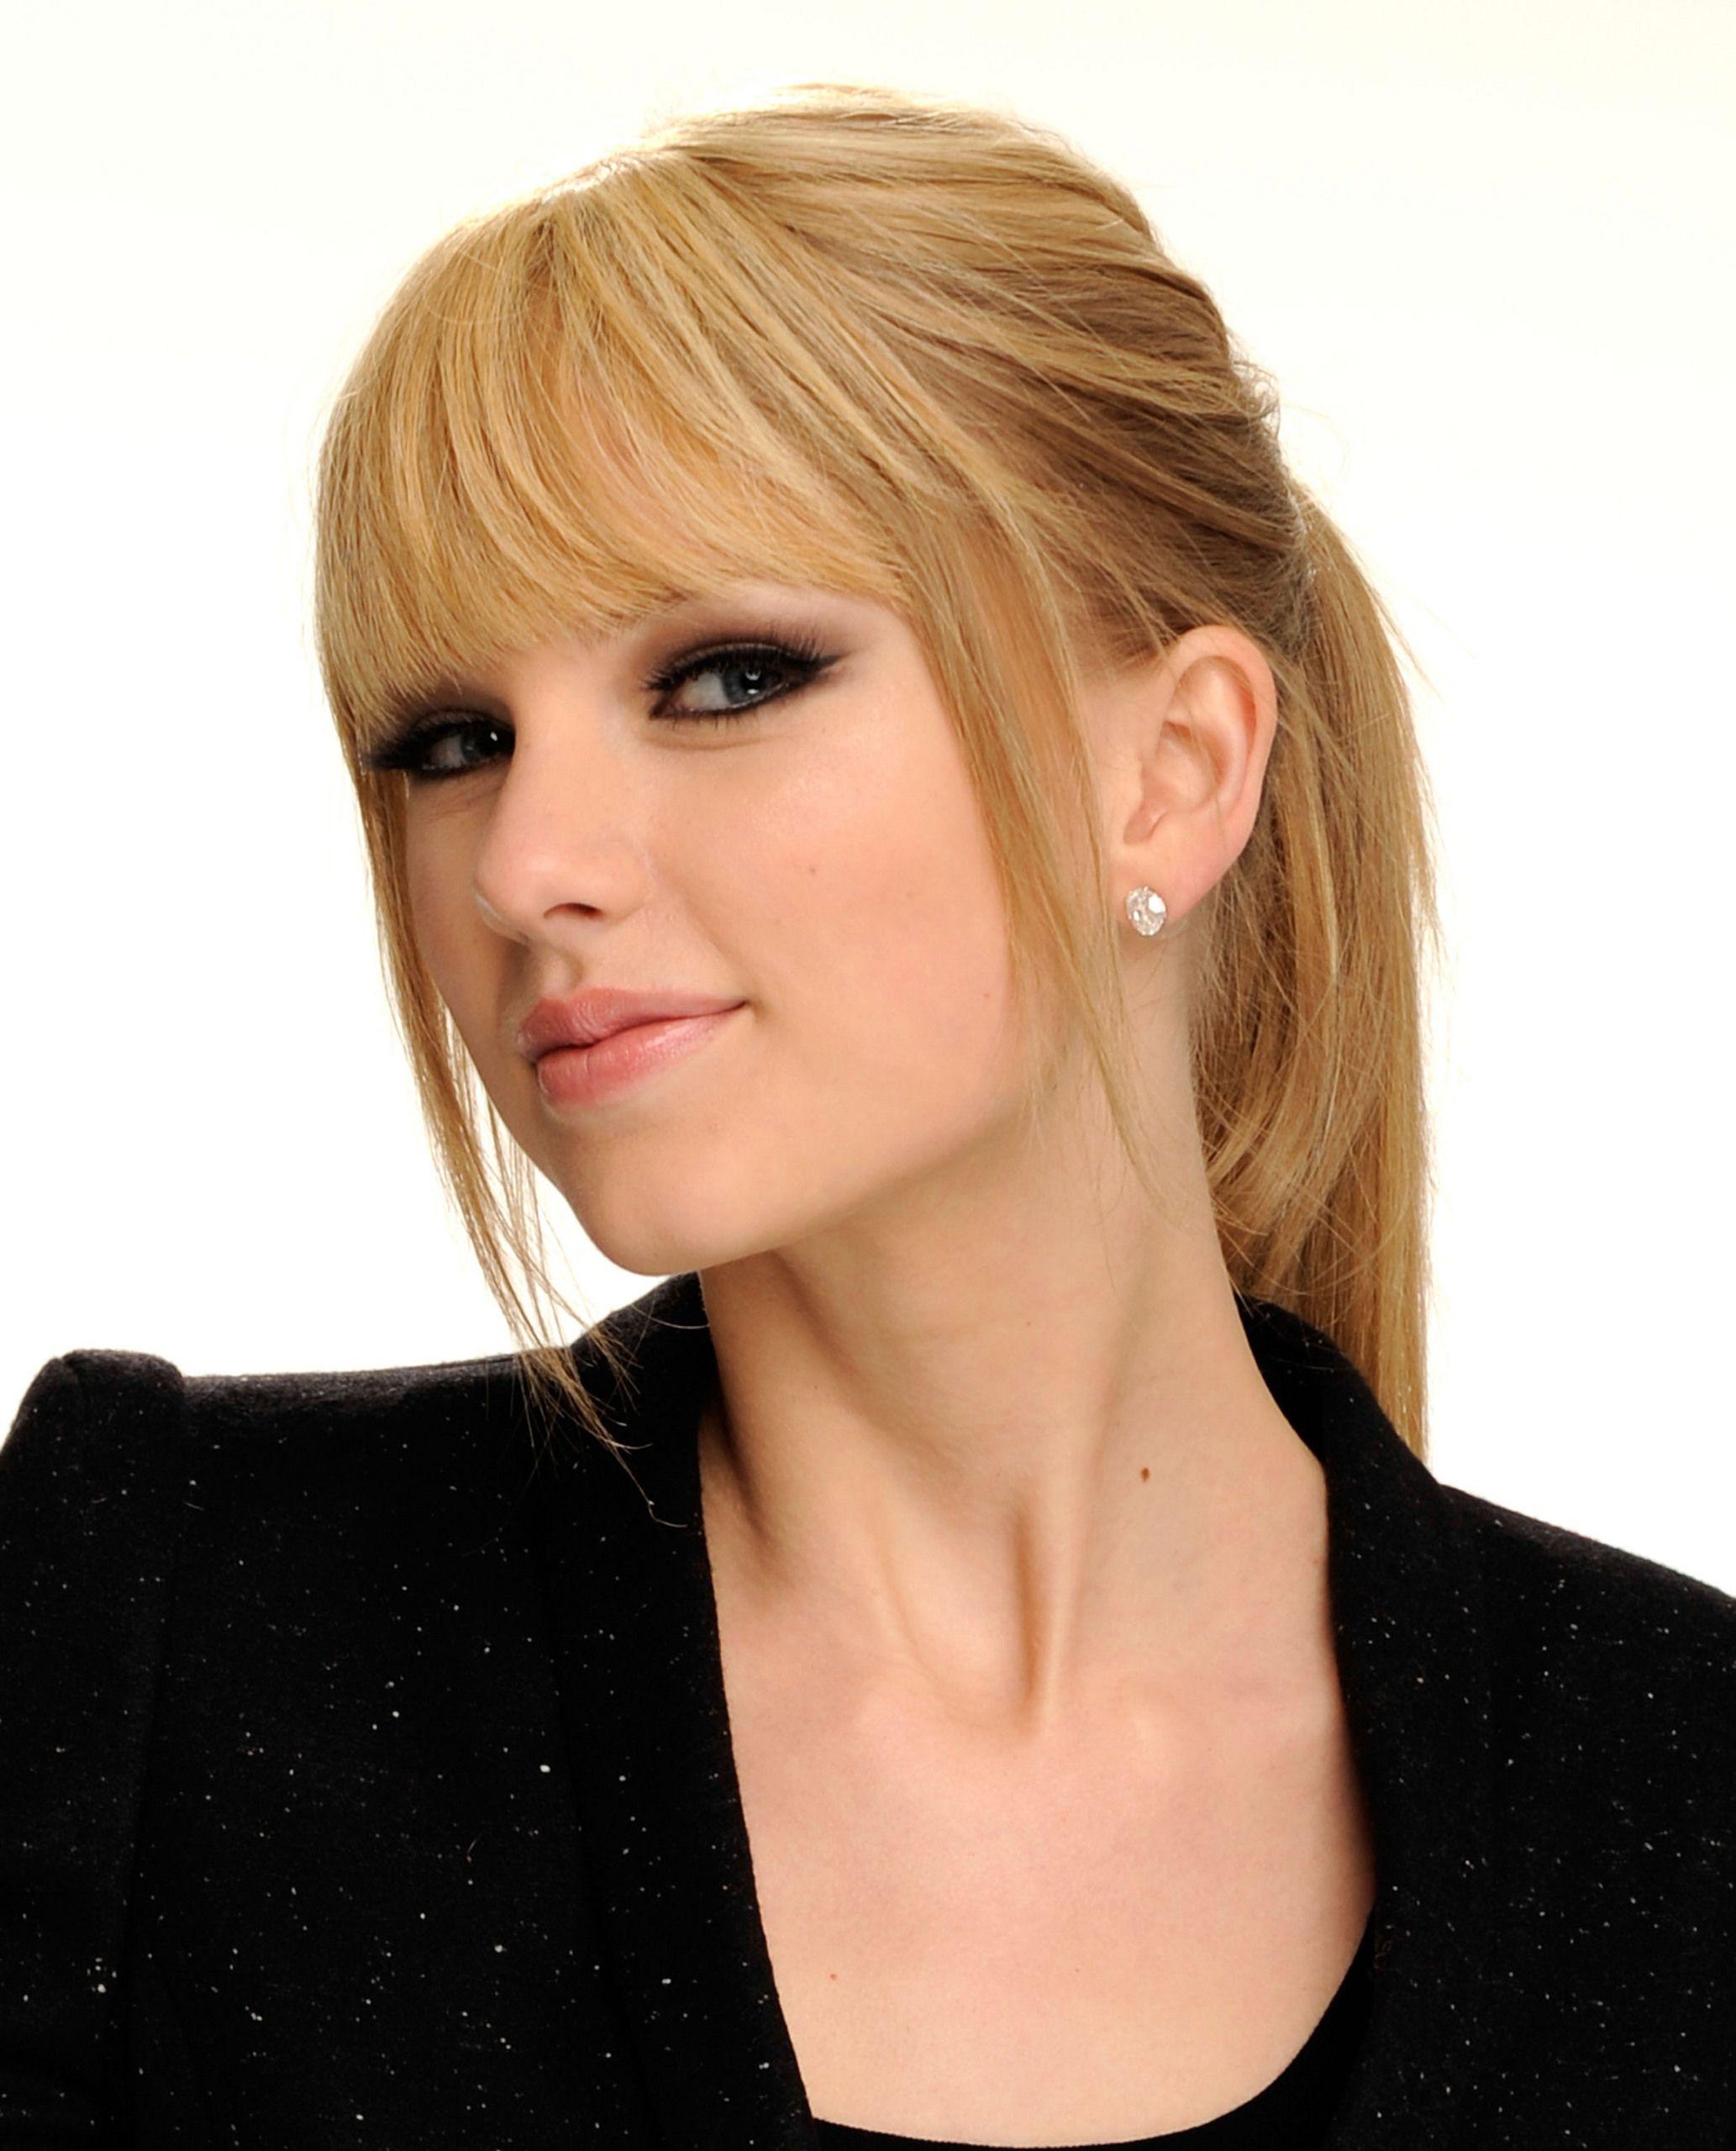 Taylor Swift 2010 American Music Awards